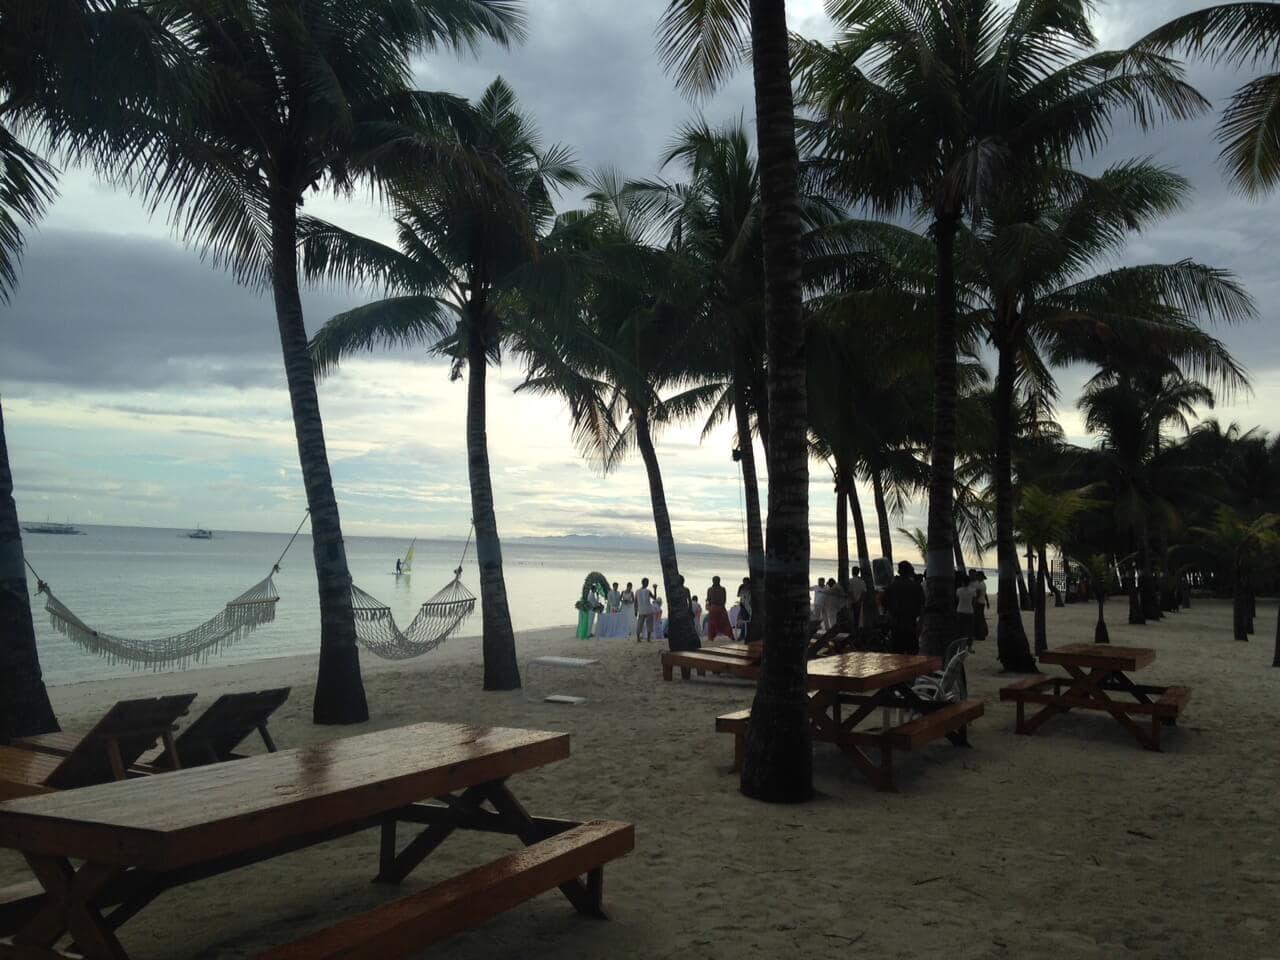 Best Boutique Hotel 2015 - Bohol Beach Club